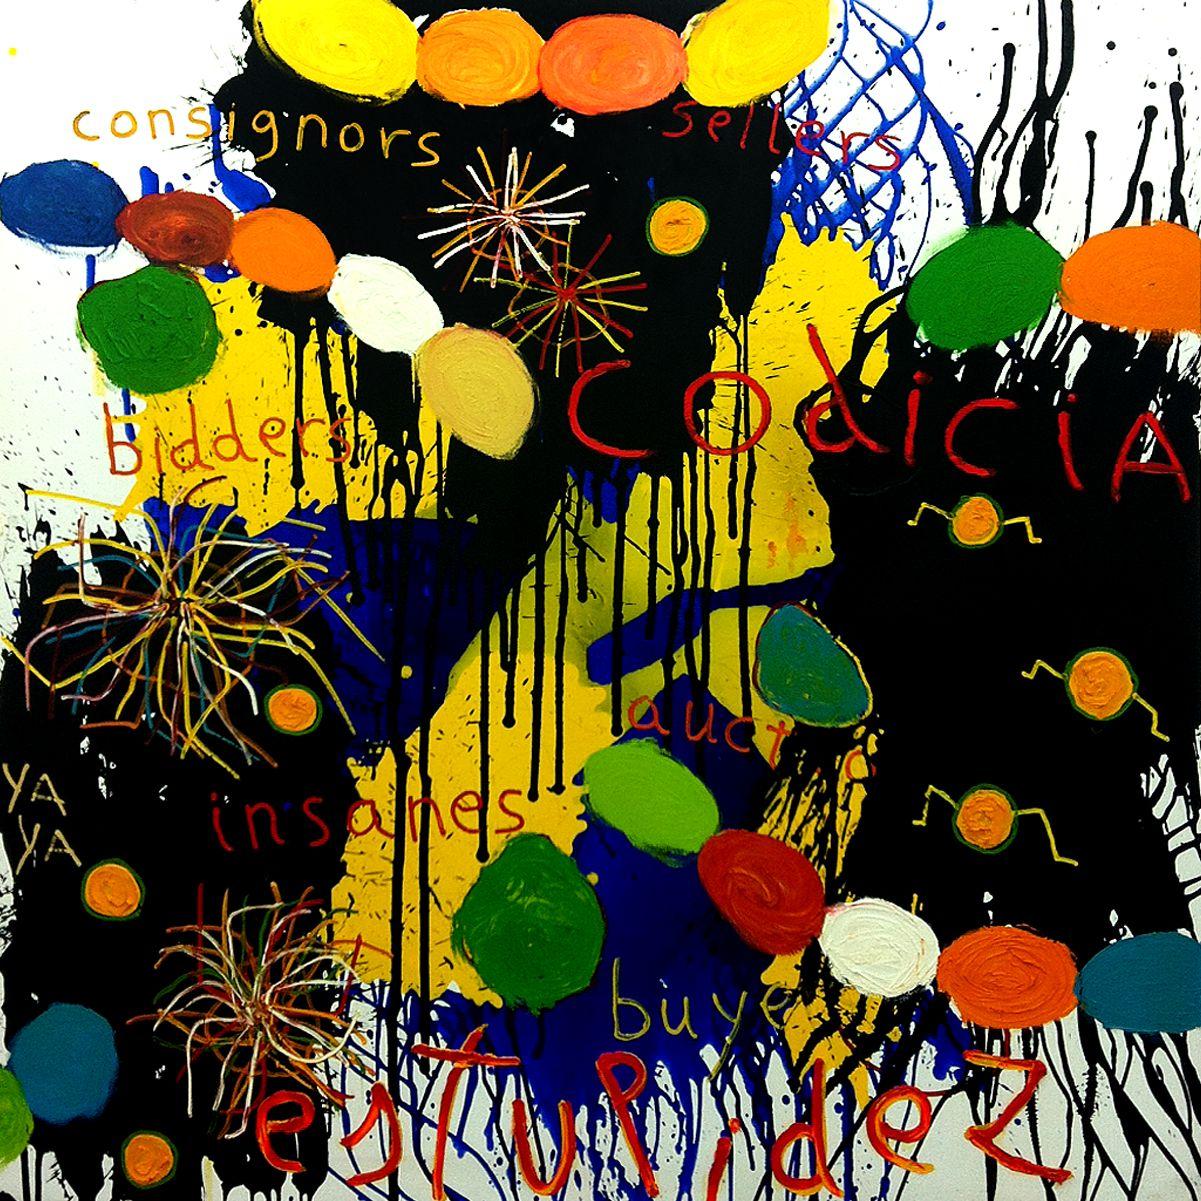 OIL / CANVAS. 200 x 200 cm. 2014